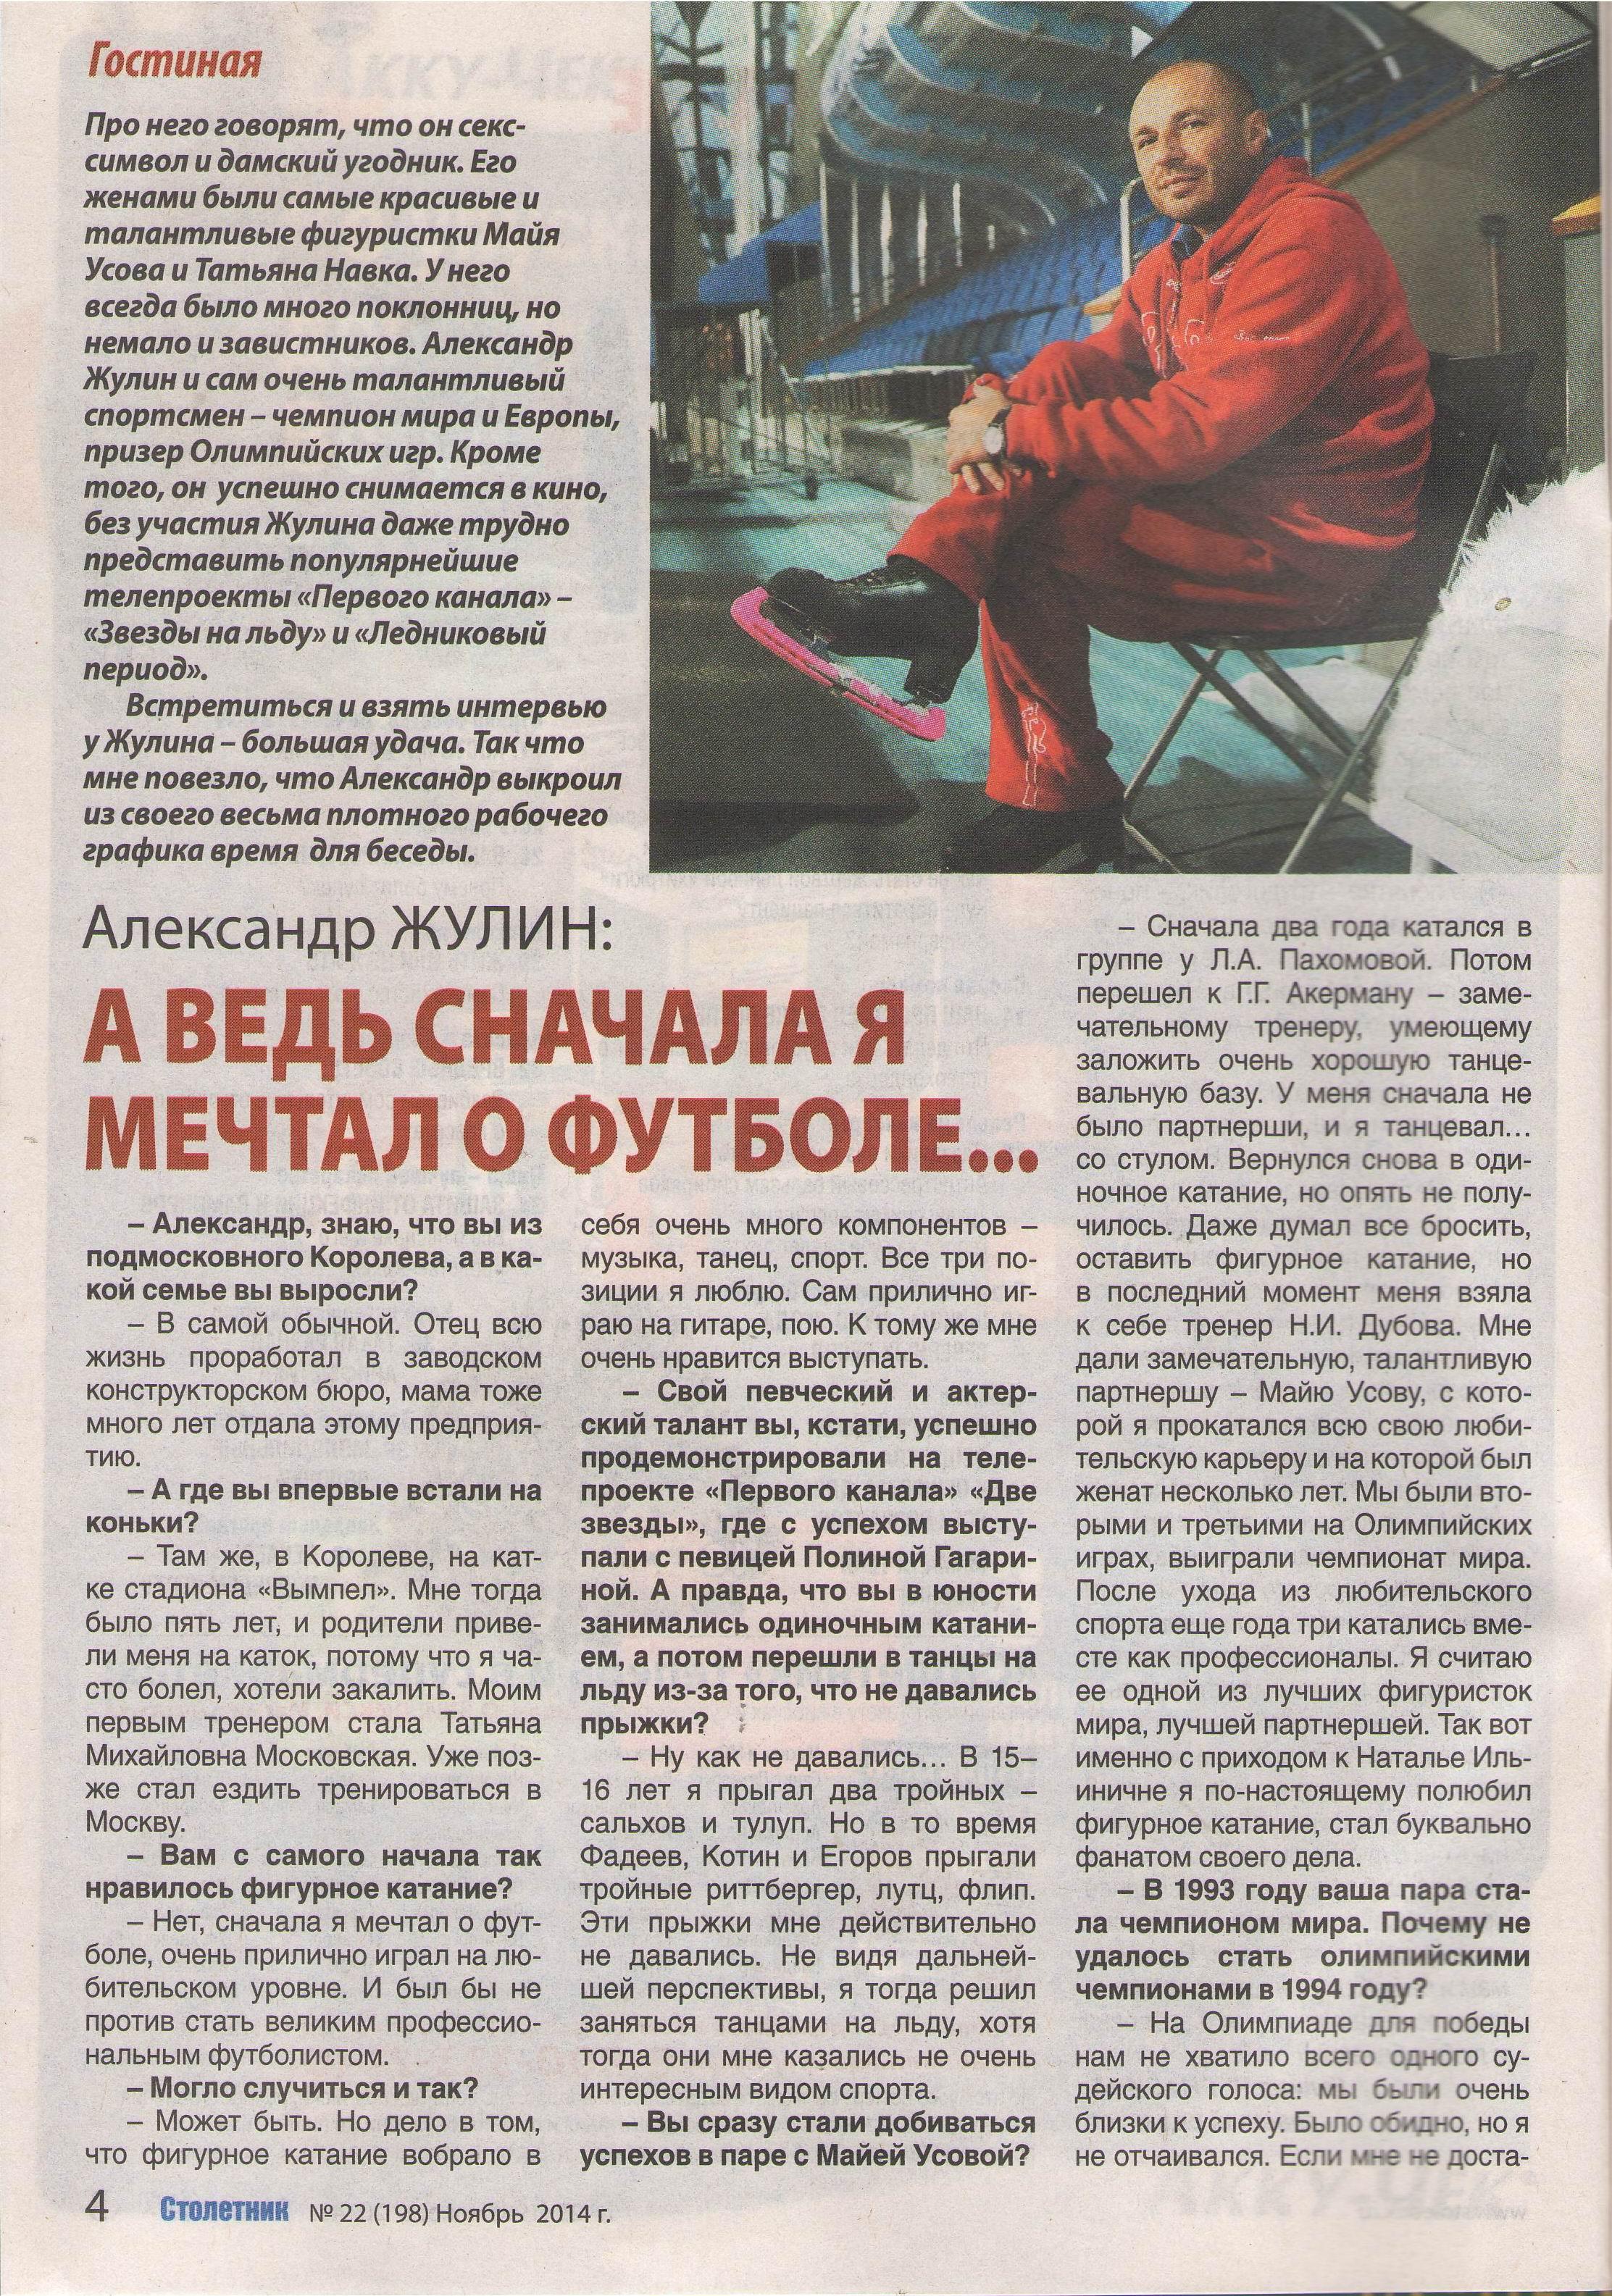 Группа Александра Жулина - Клуб: СШОР «Москвич» (Москва)  YrmkZ